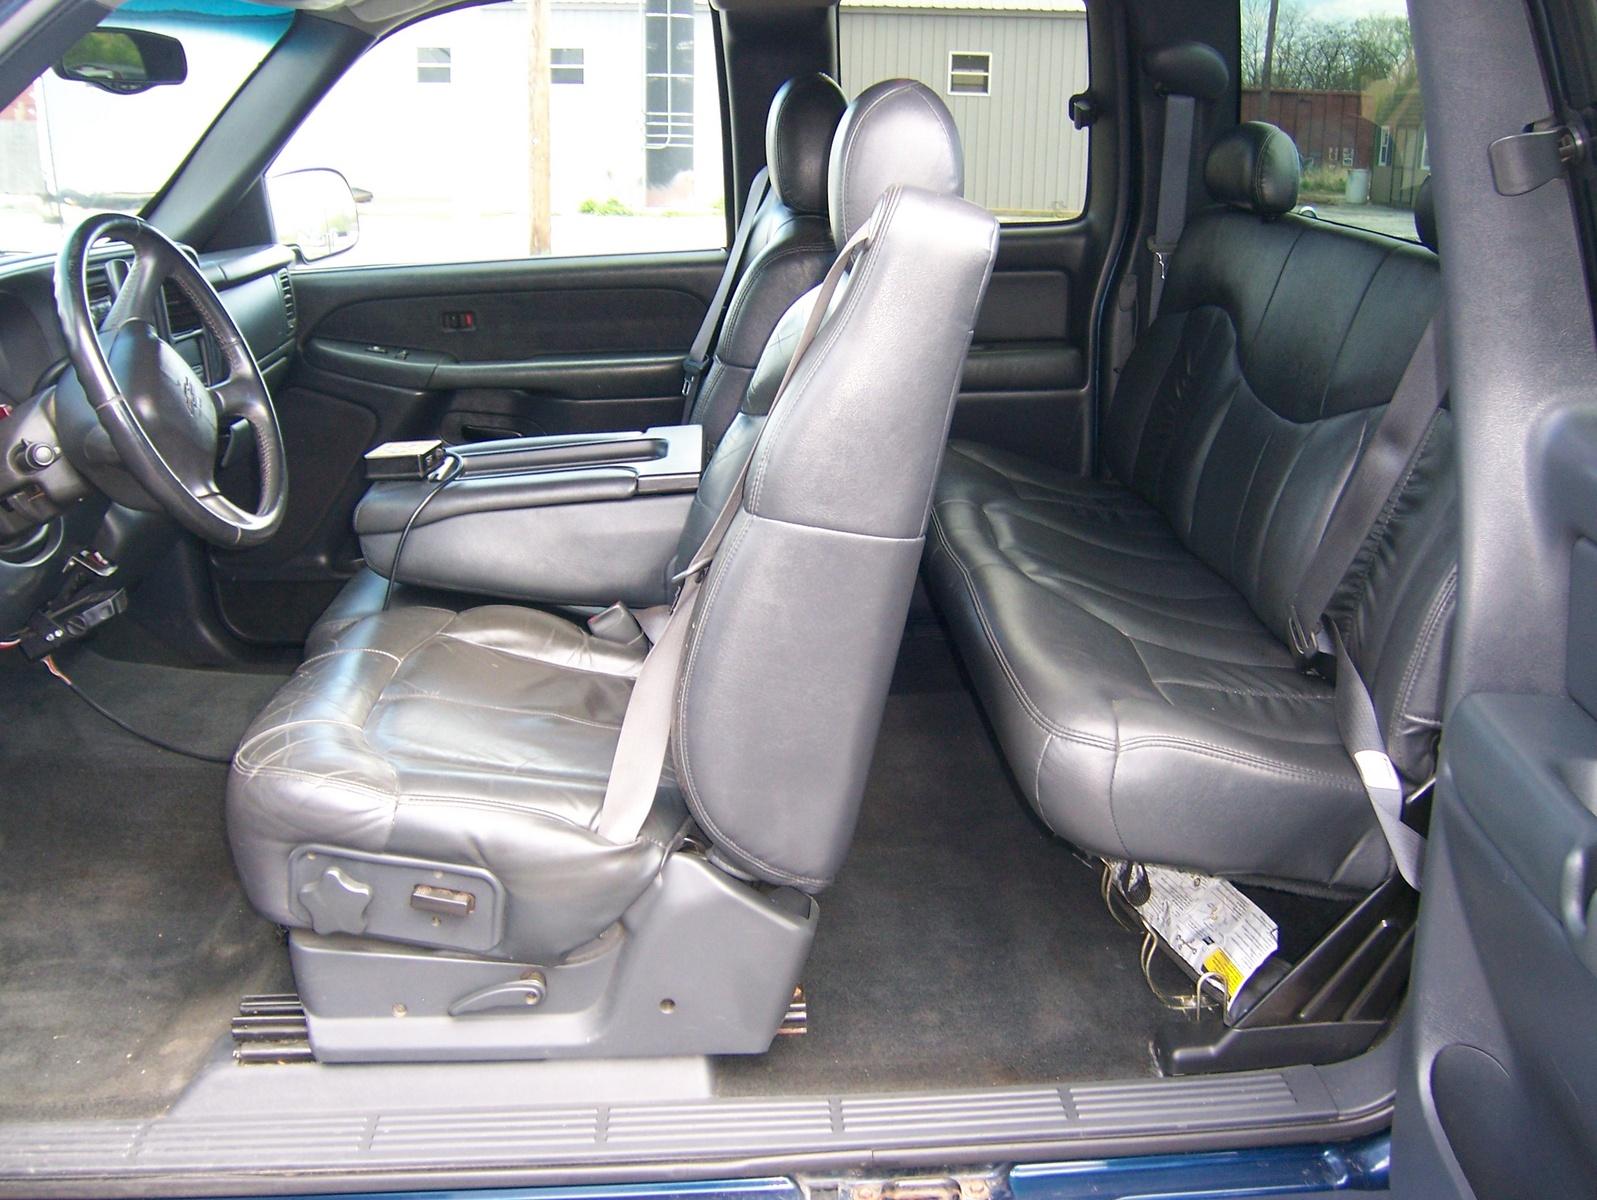 2000 chevy silverado interior - 2000 chevy silverado 1500 interior ...